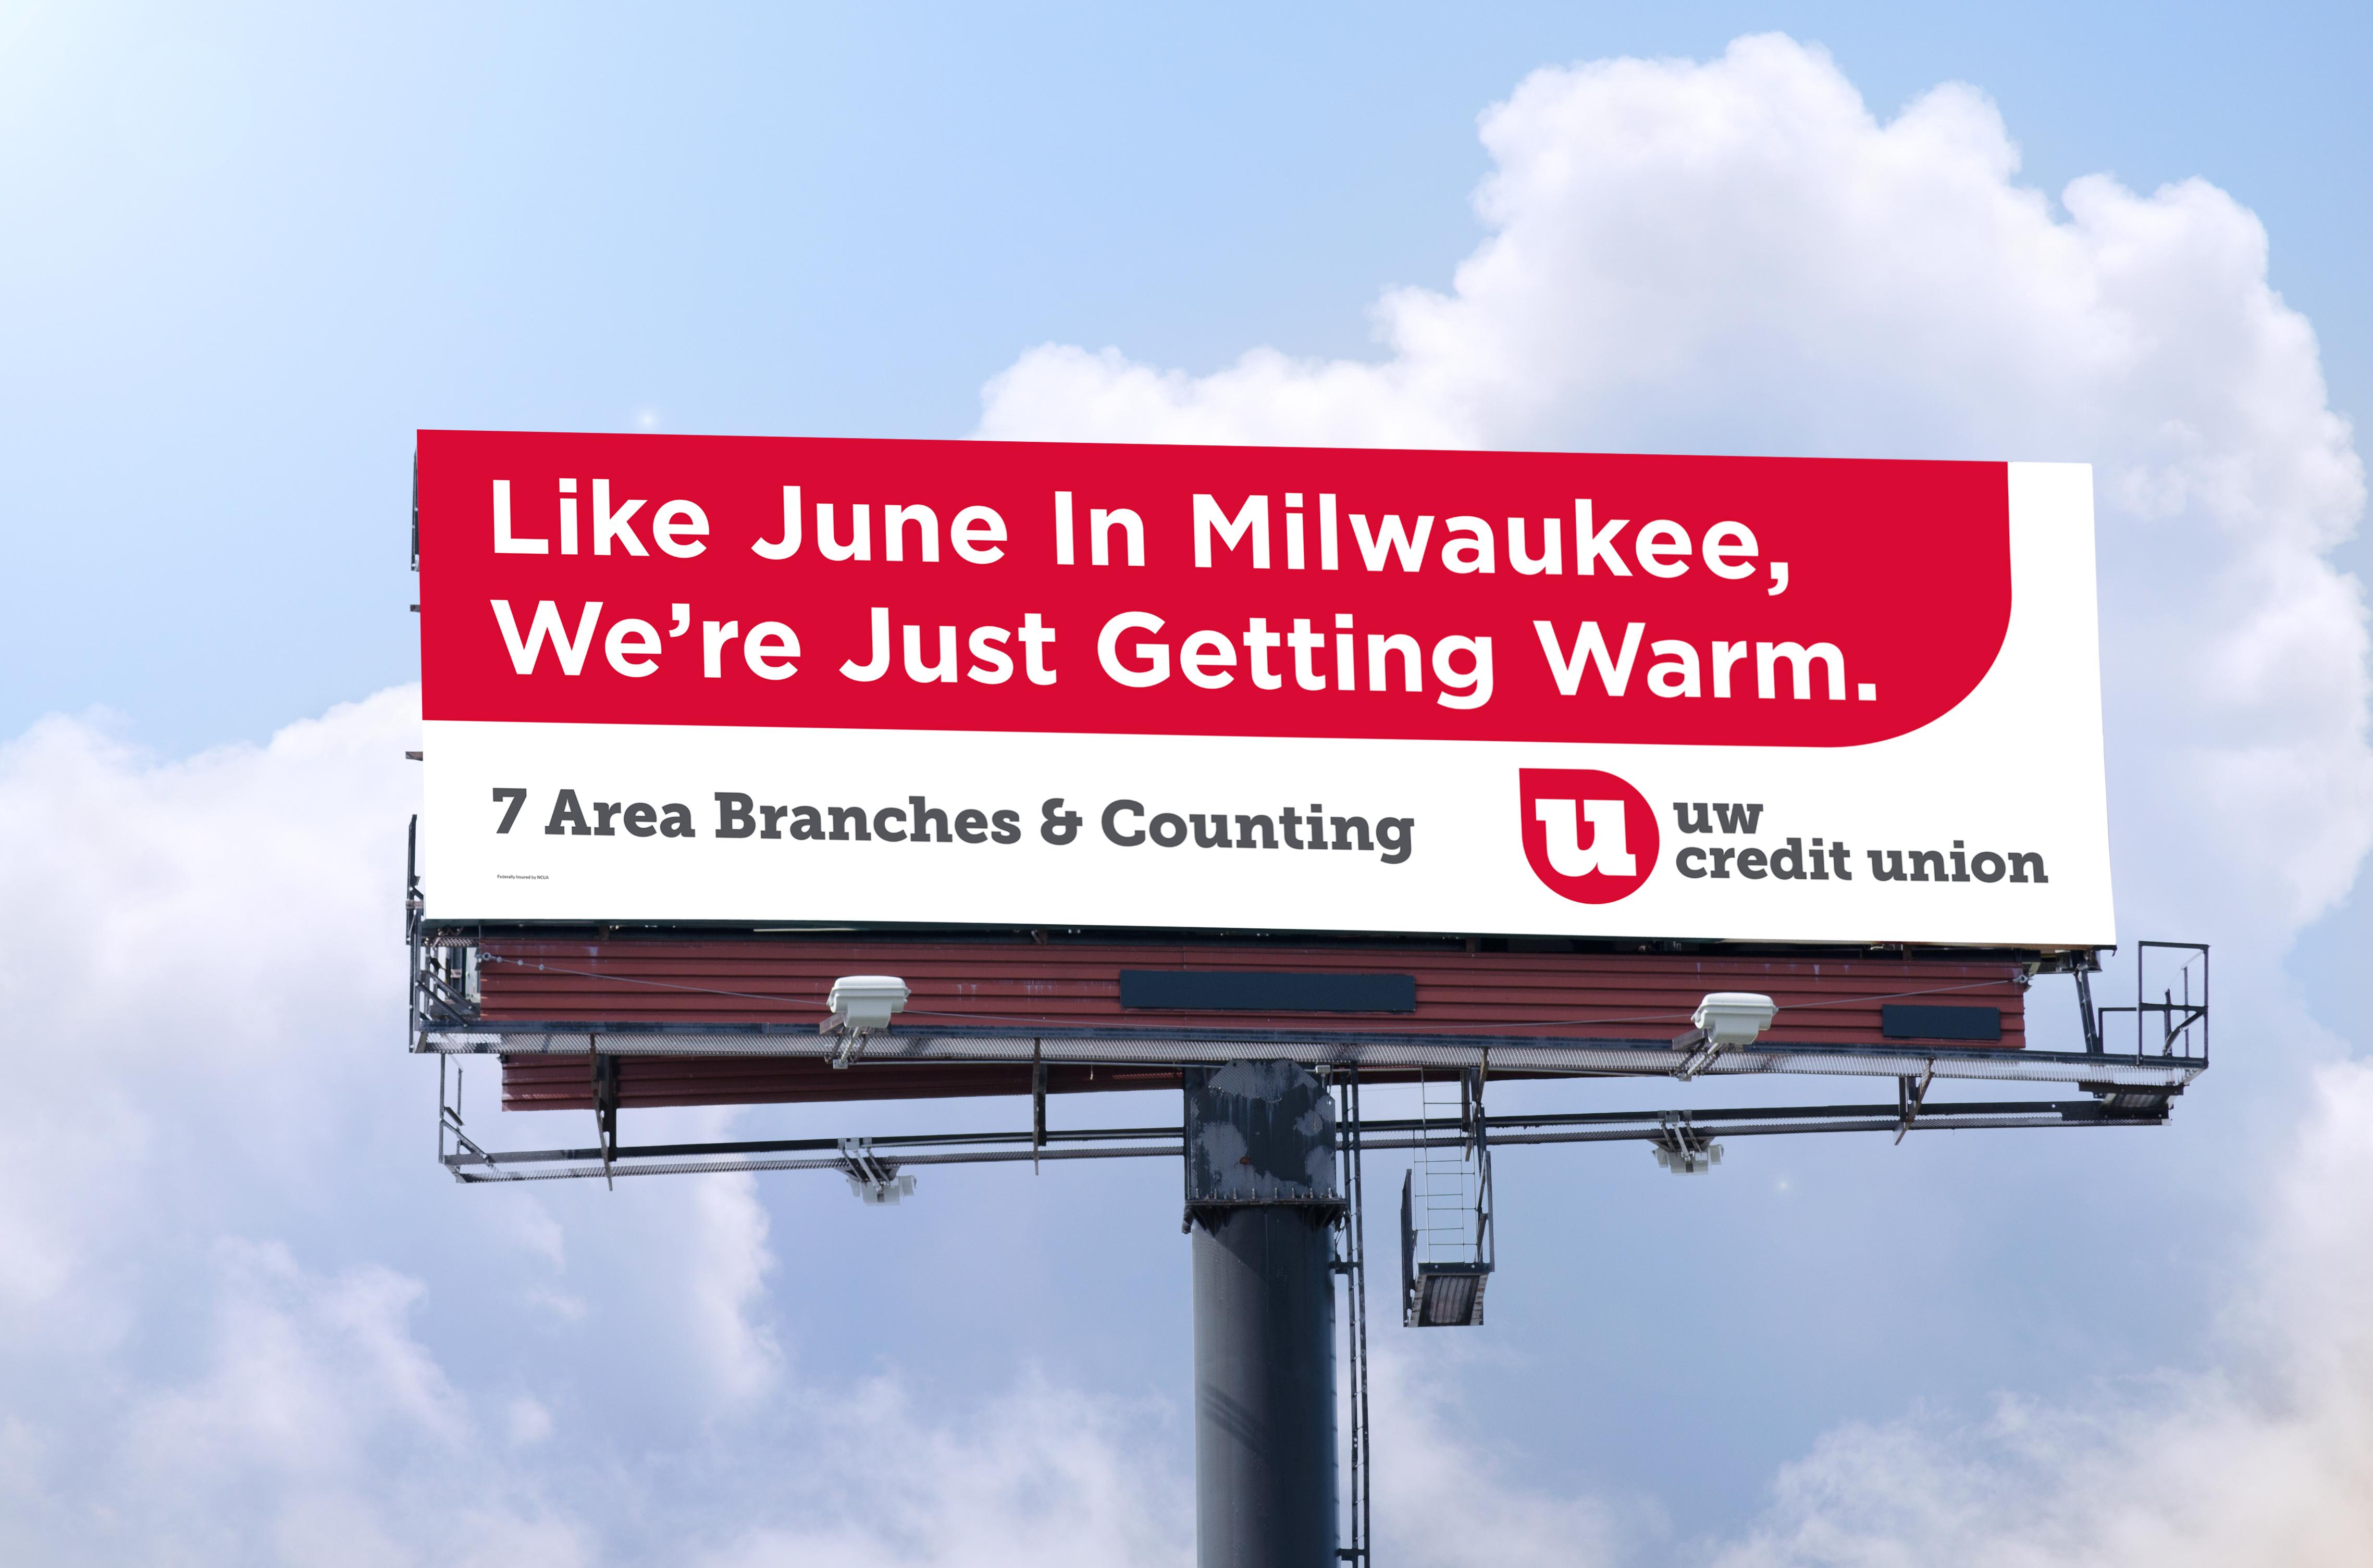 Blank roadside billboard on bright sunny blue sky day